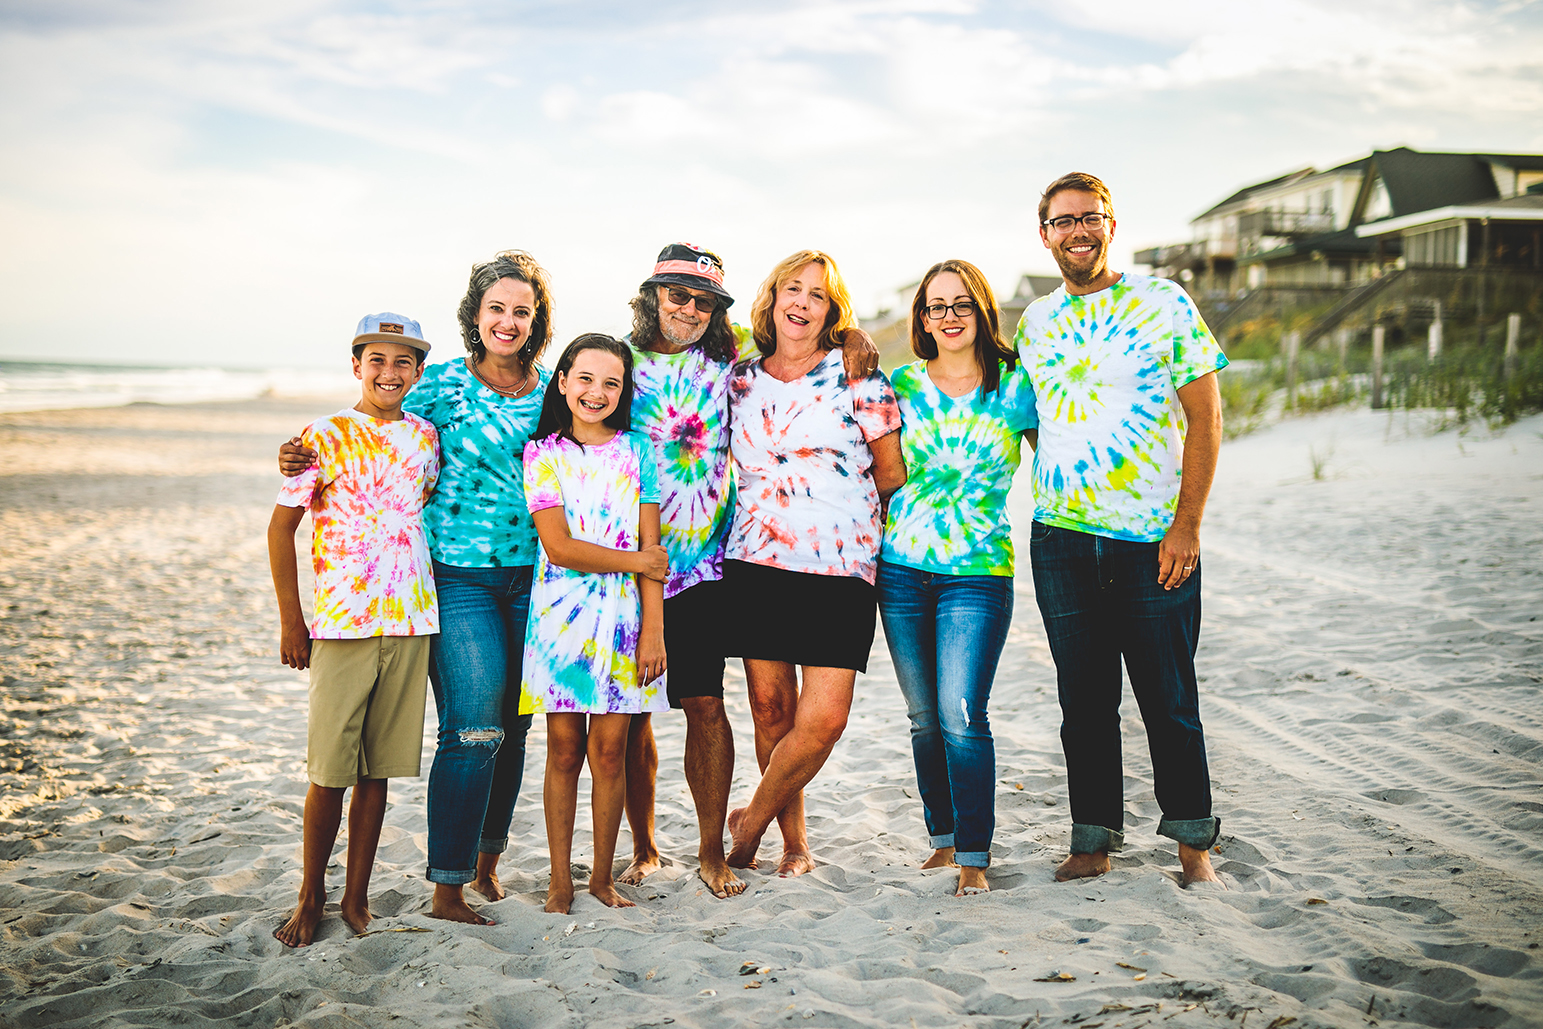 Family+in+Tie+dye+shirts.jpg